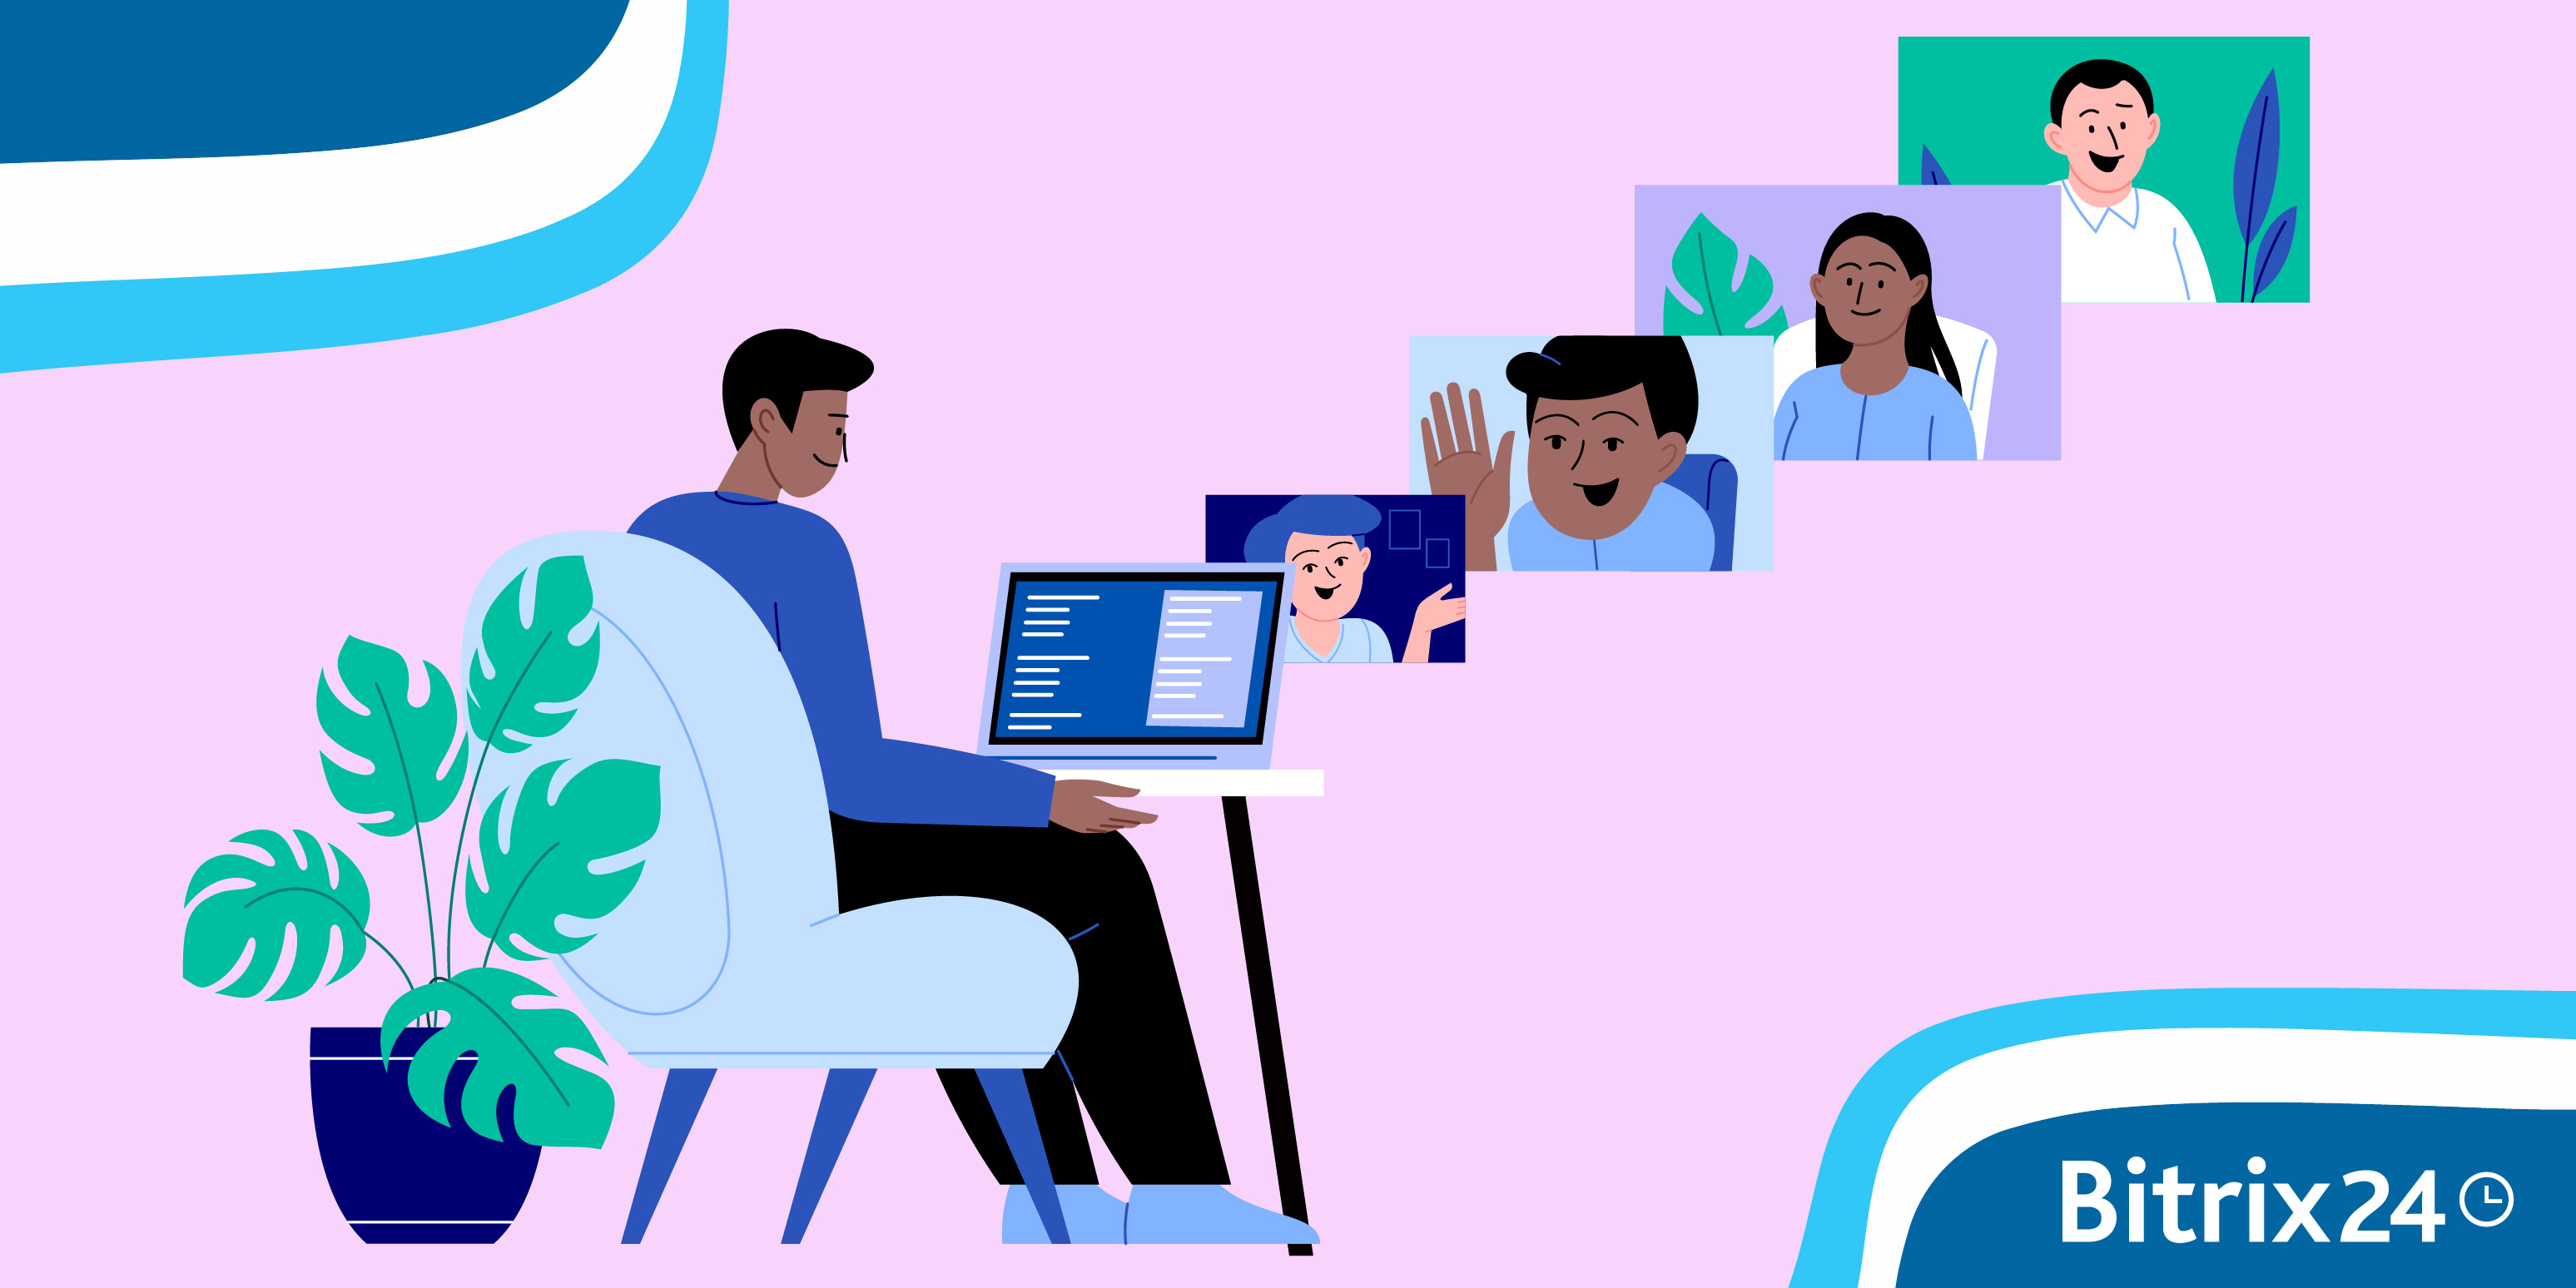 Confronto tra utenti Extranet e Intranet